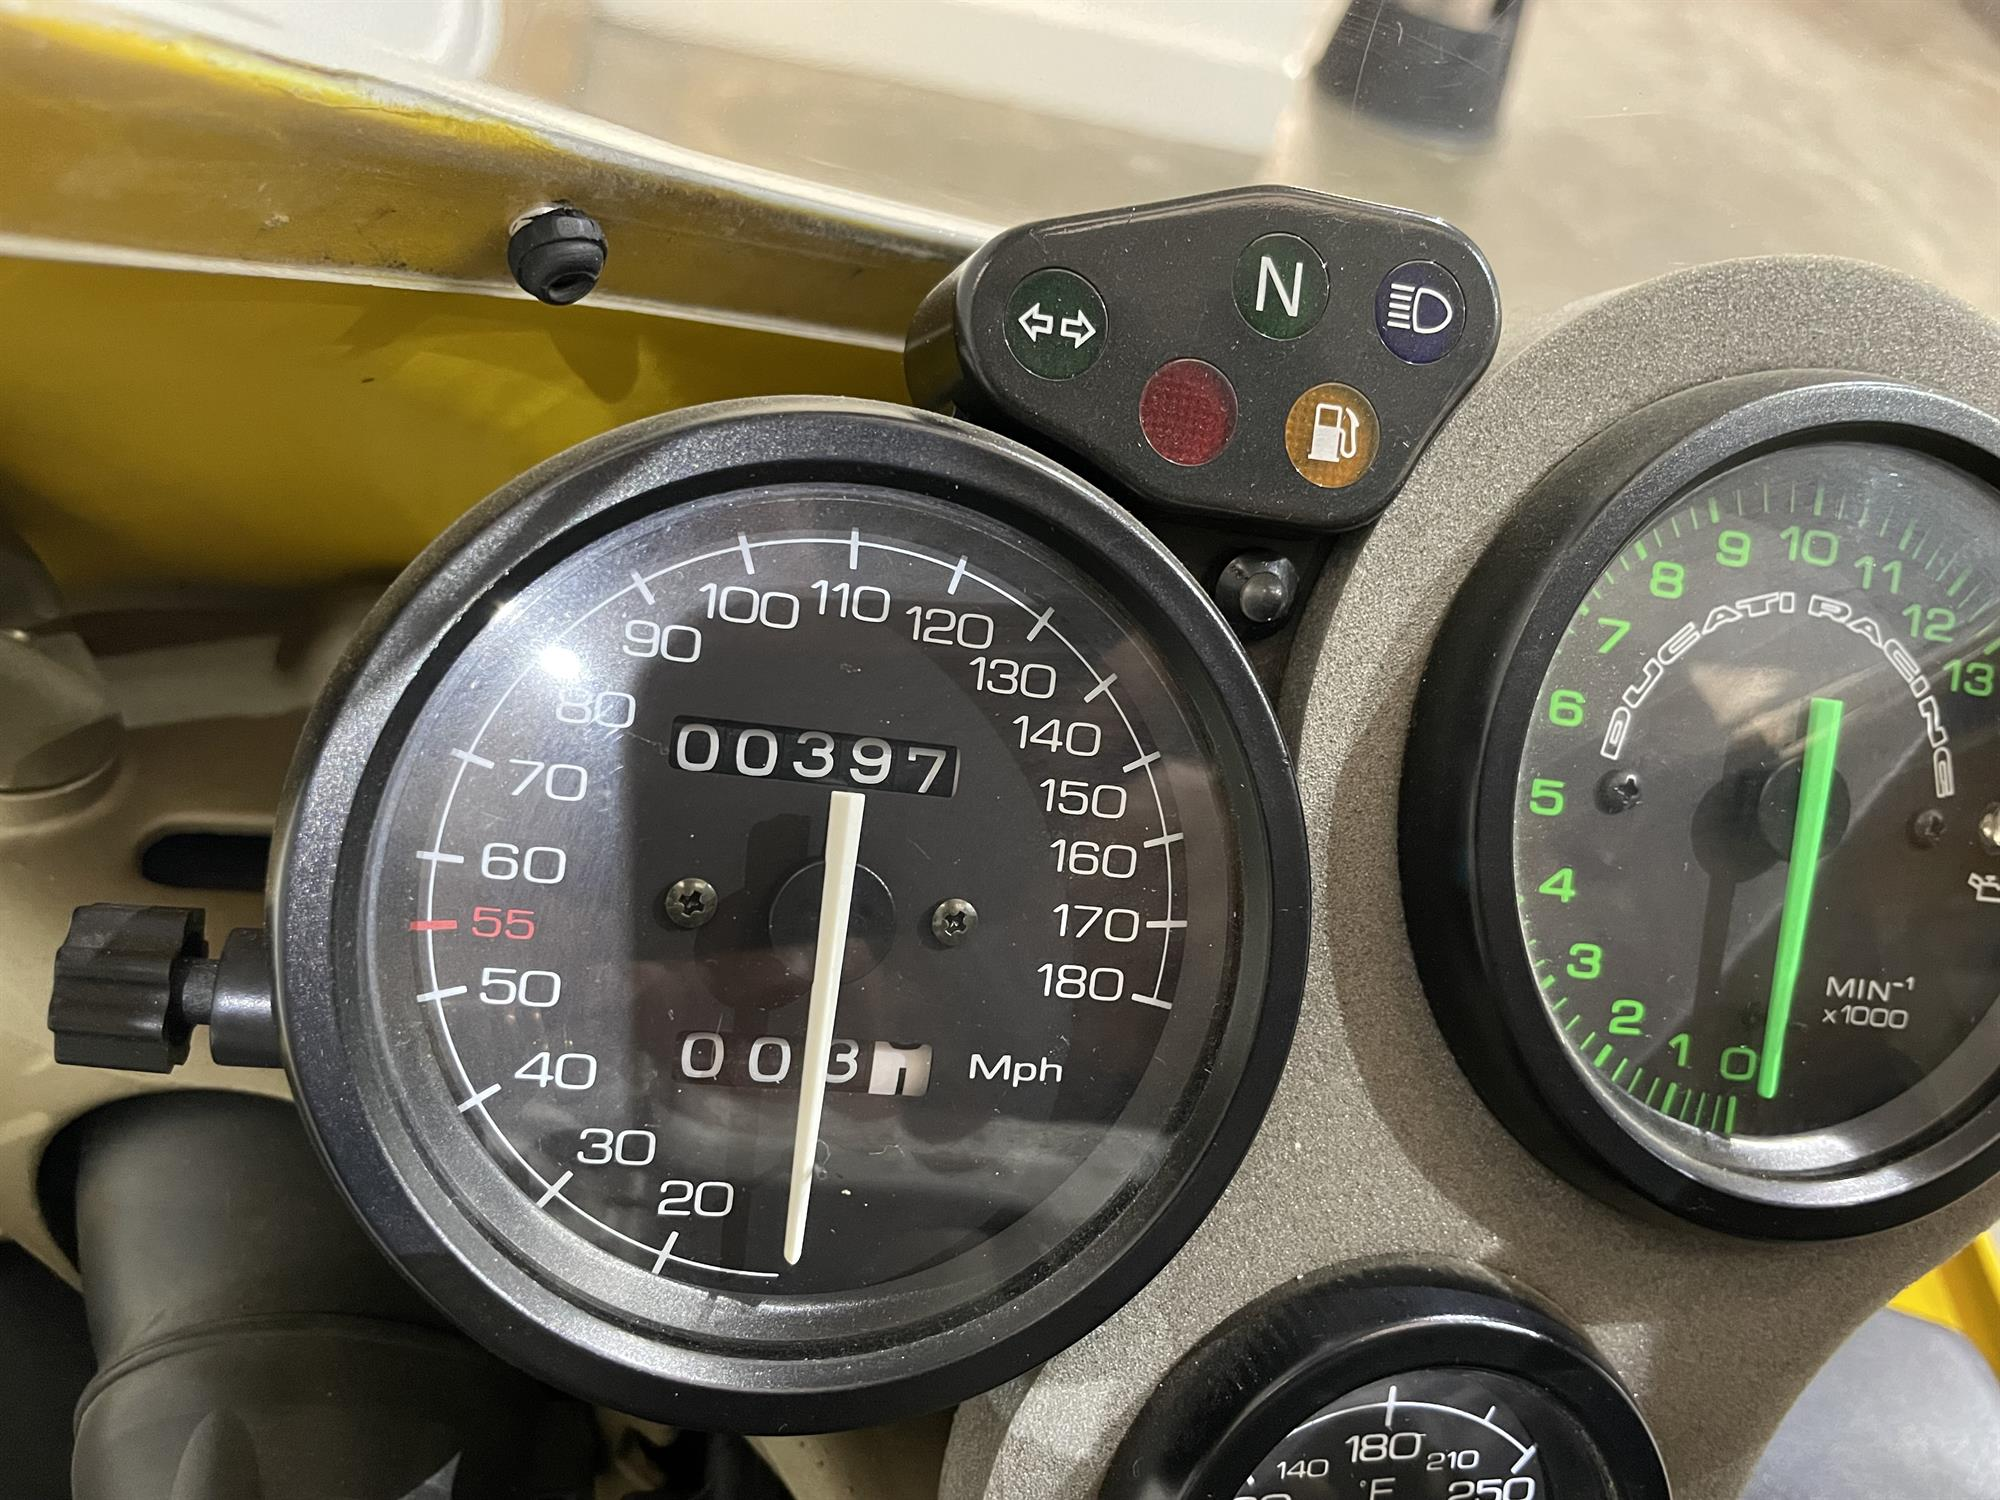 1998 Ducati 748 SPS - Image 10 of 10